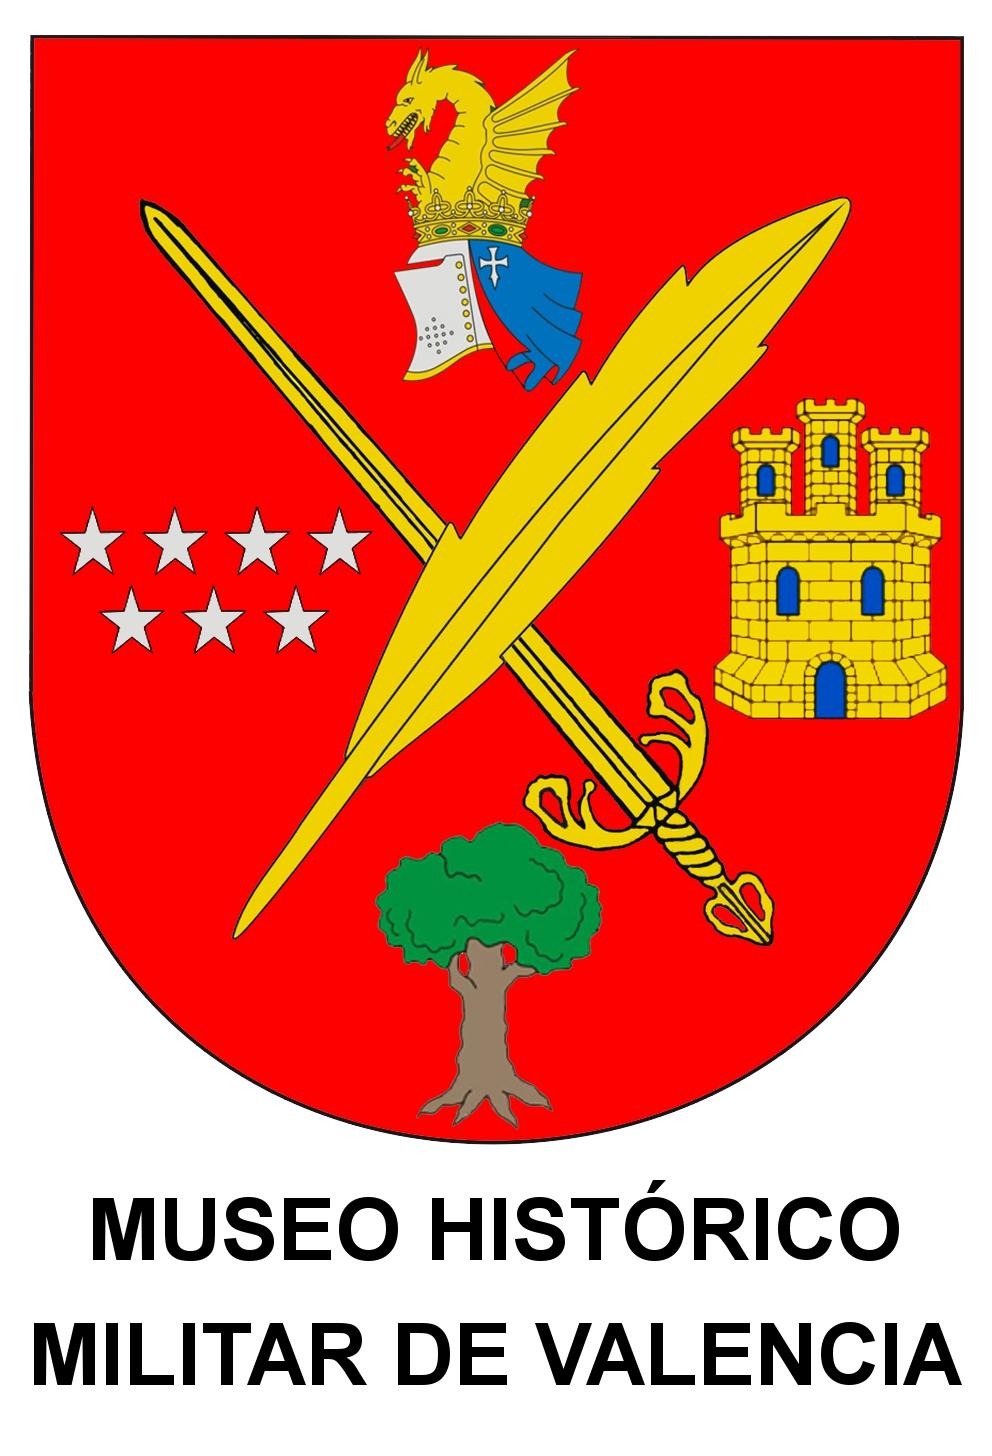 Museo Histórico Militar De Valencia